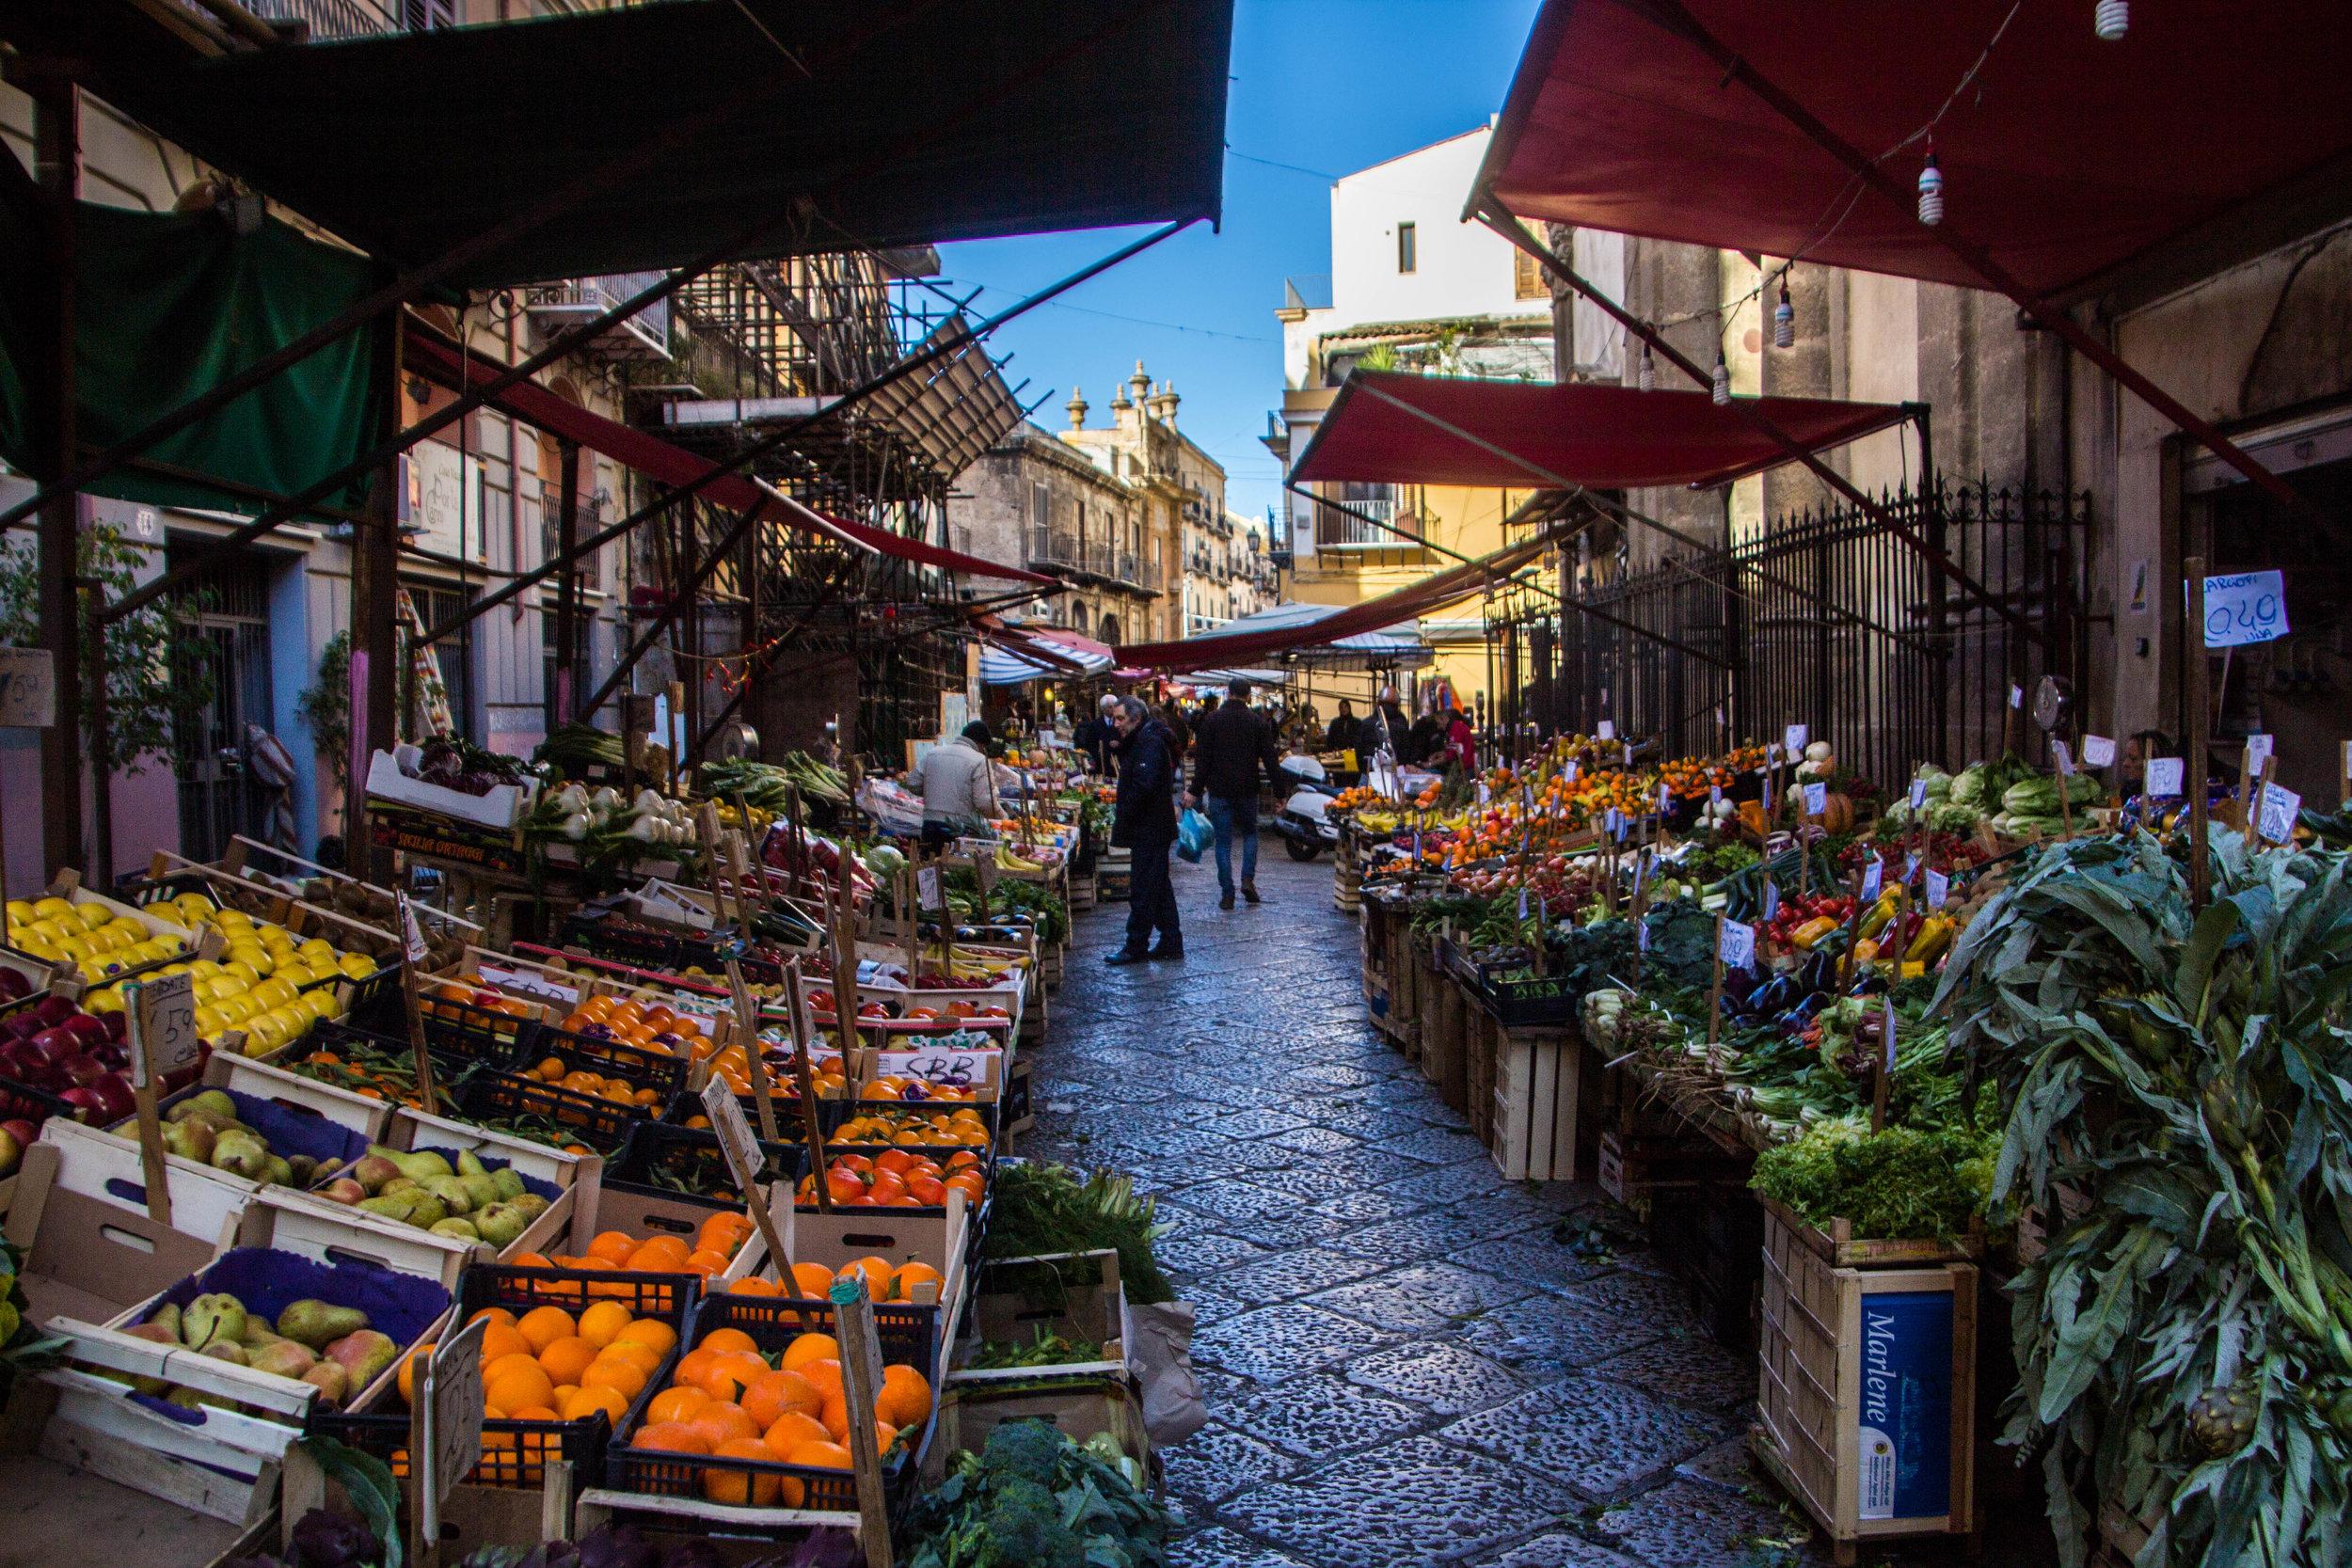 street-markets-palermo-sicily-14.jpg